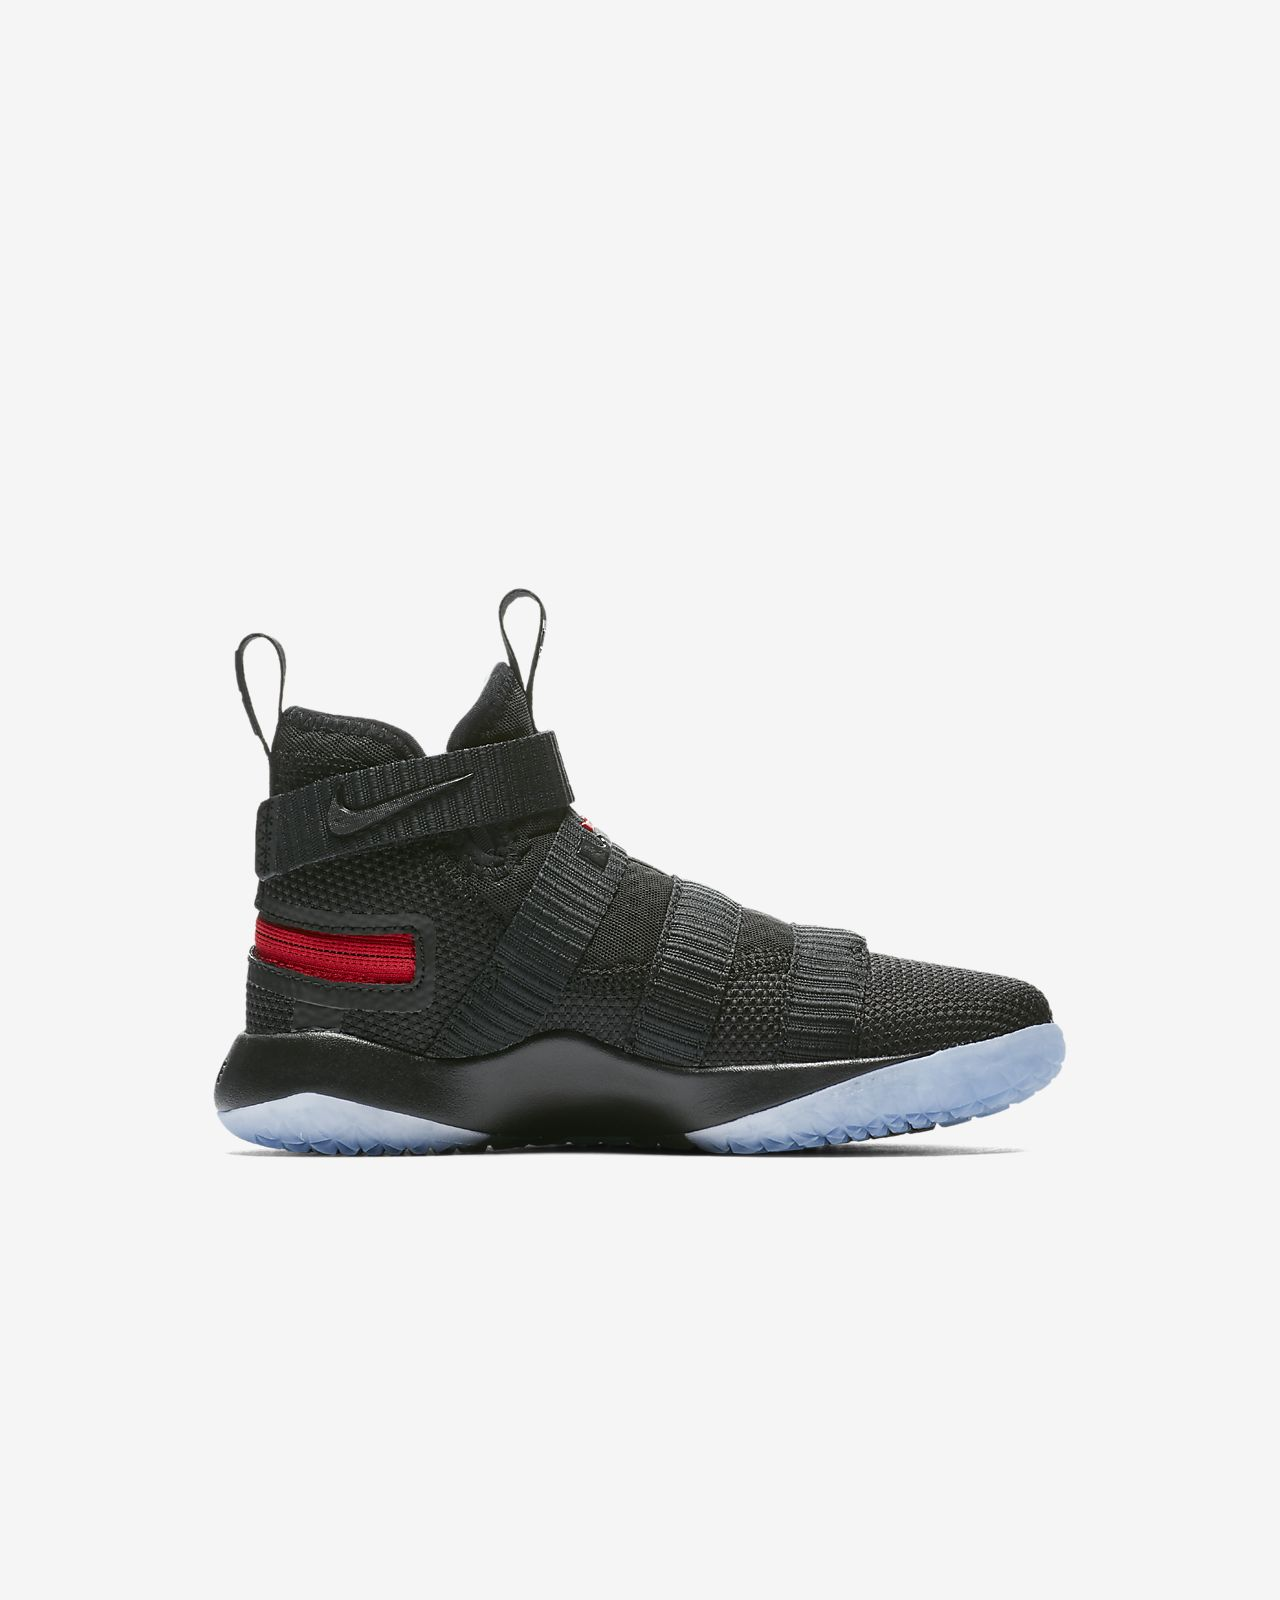 d97c6780927 LeBron Soldier 11 FlyEase Little Kids  Shoe. Nike.com